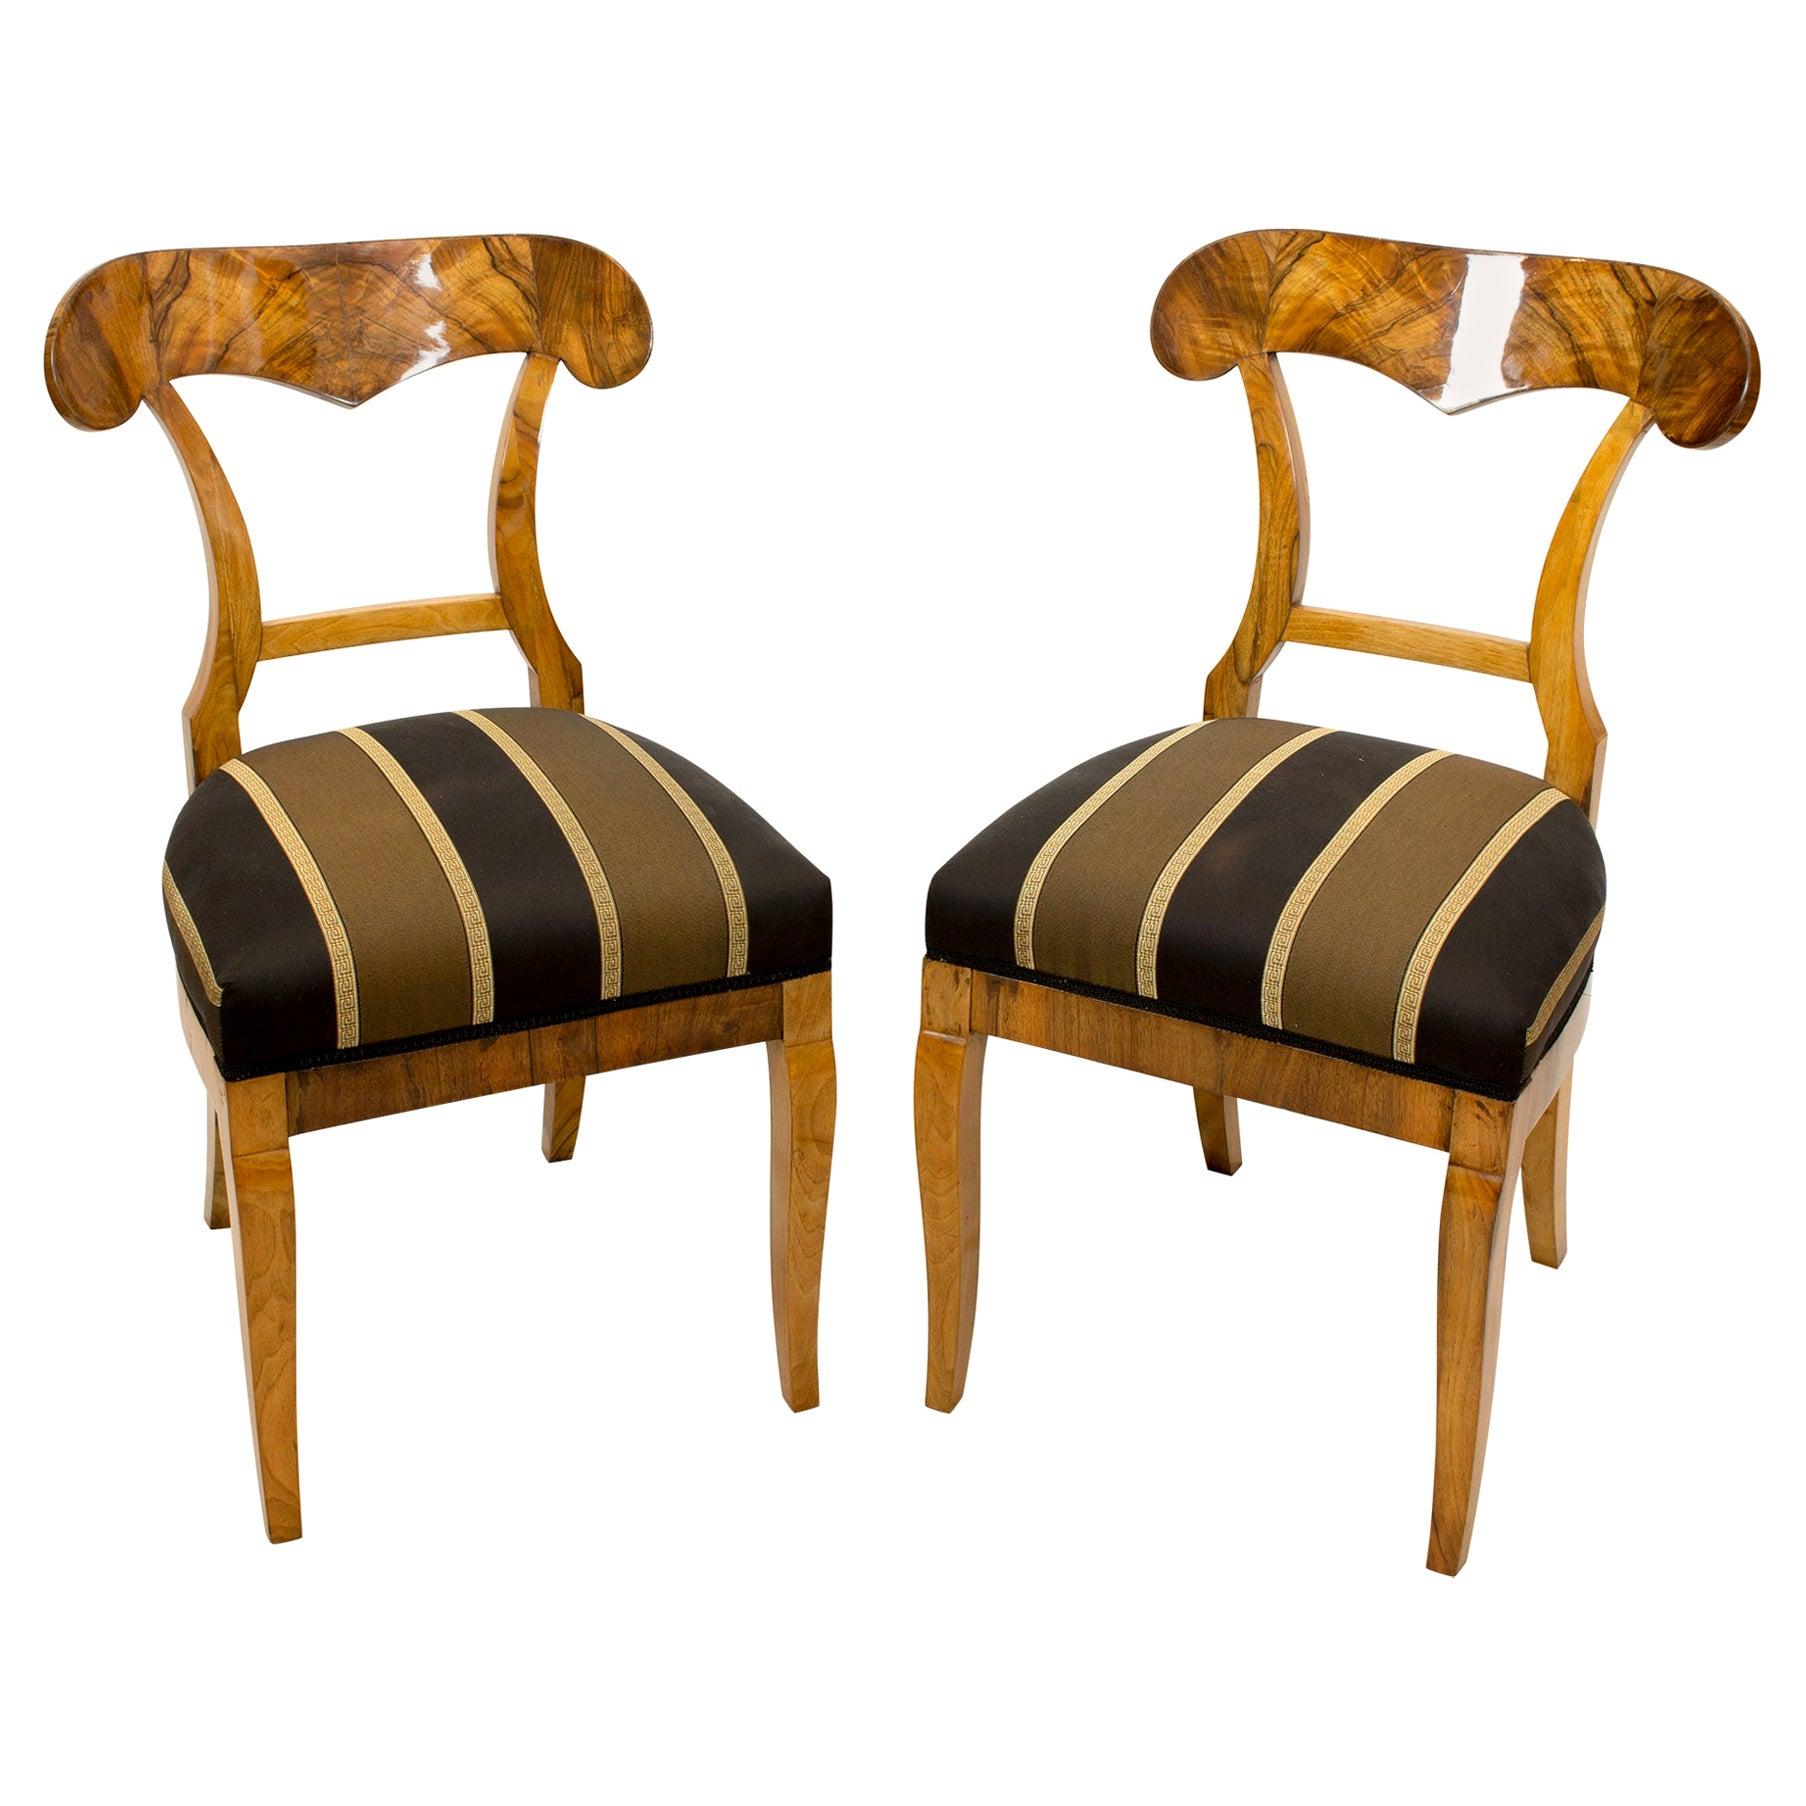 19th Century Biedermeier Walnut Pair of Shovel Chairs